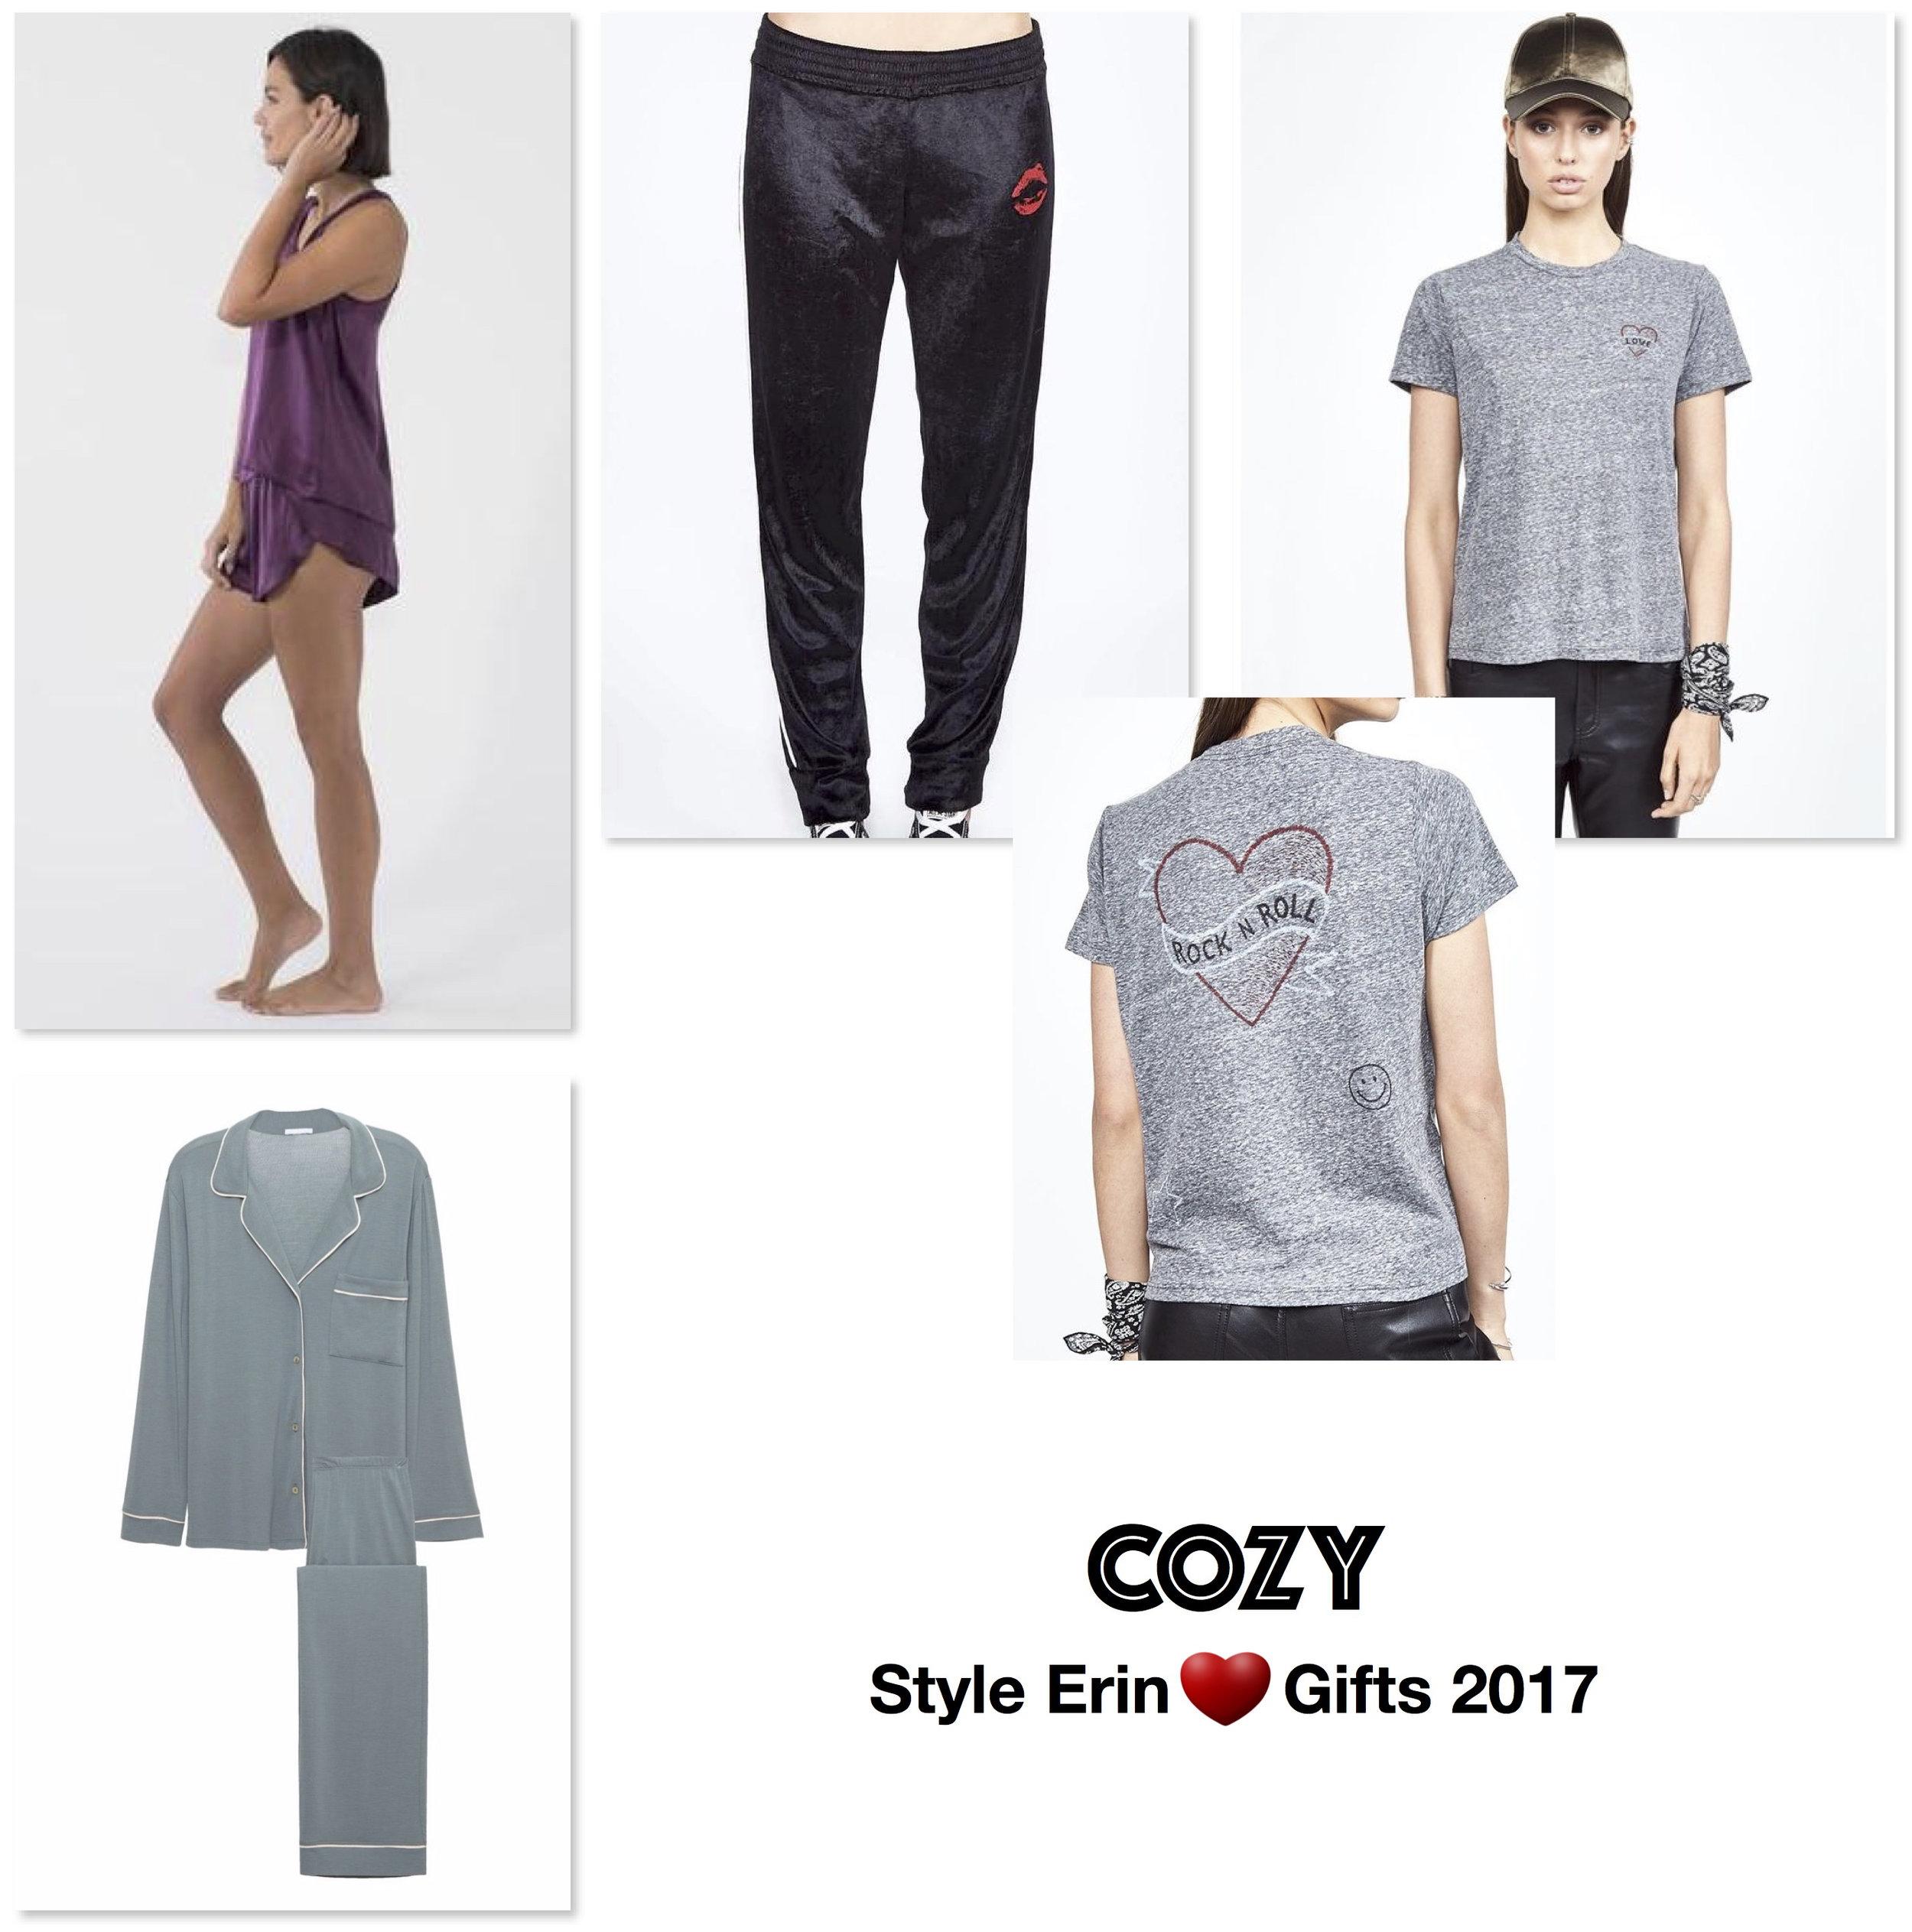 cozygifts-website.jpg